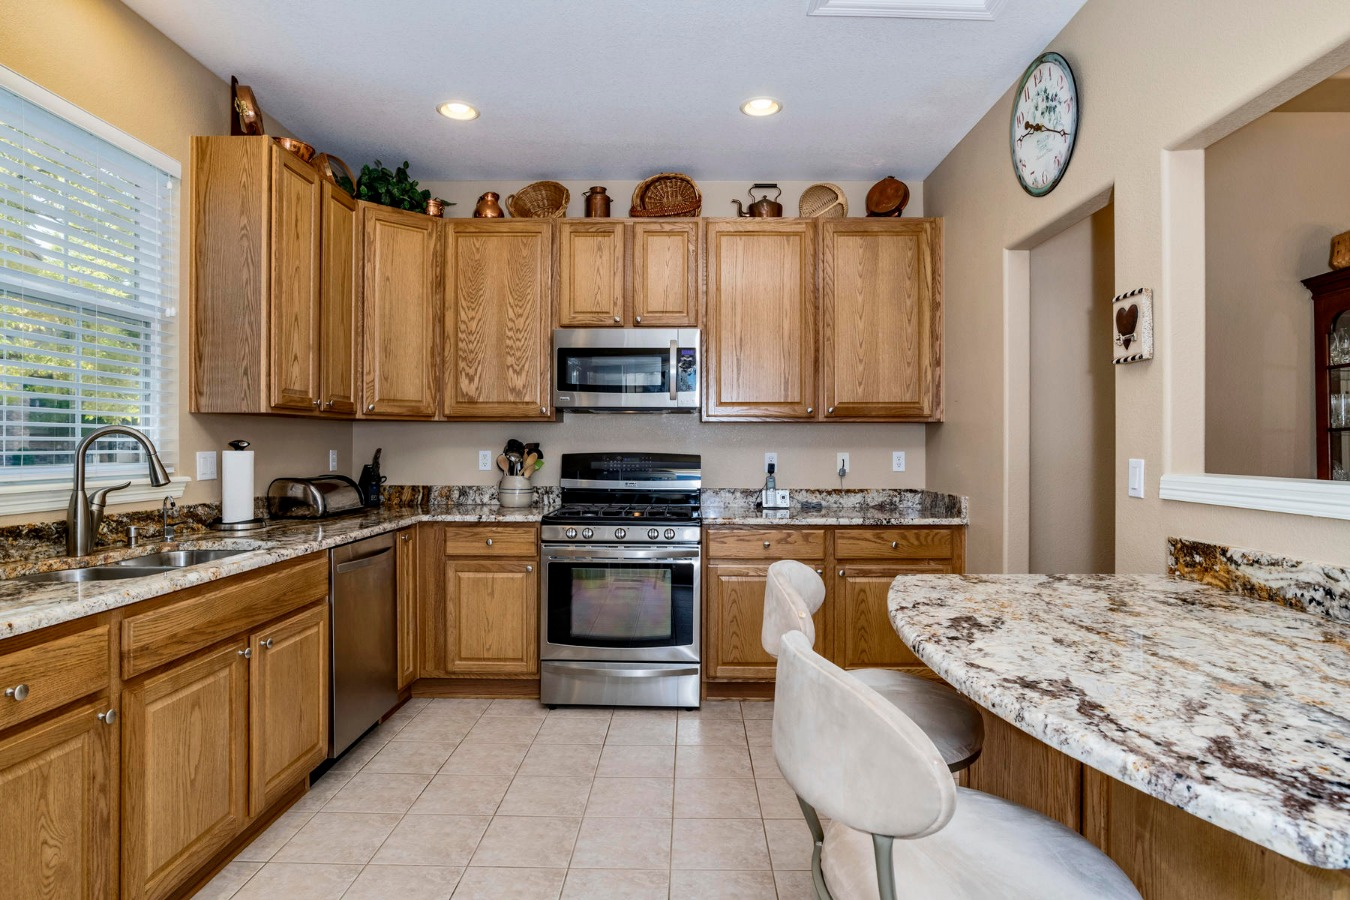 Gas Range & Tiled Kitchen Floor